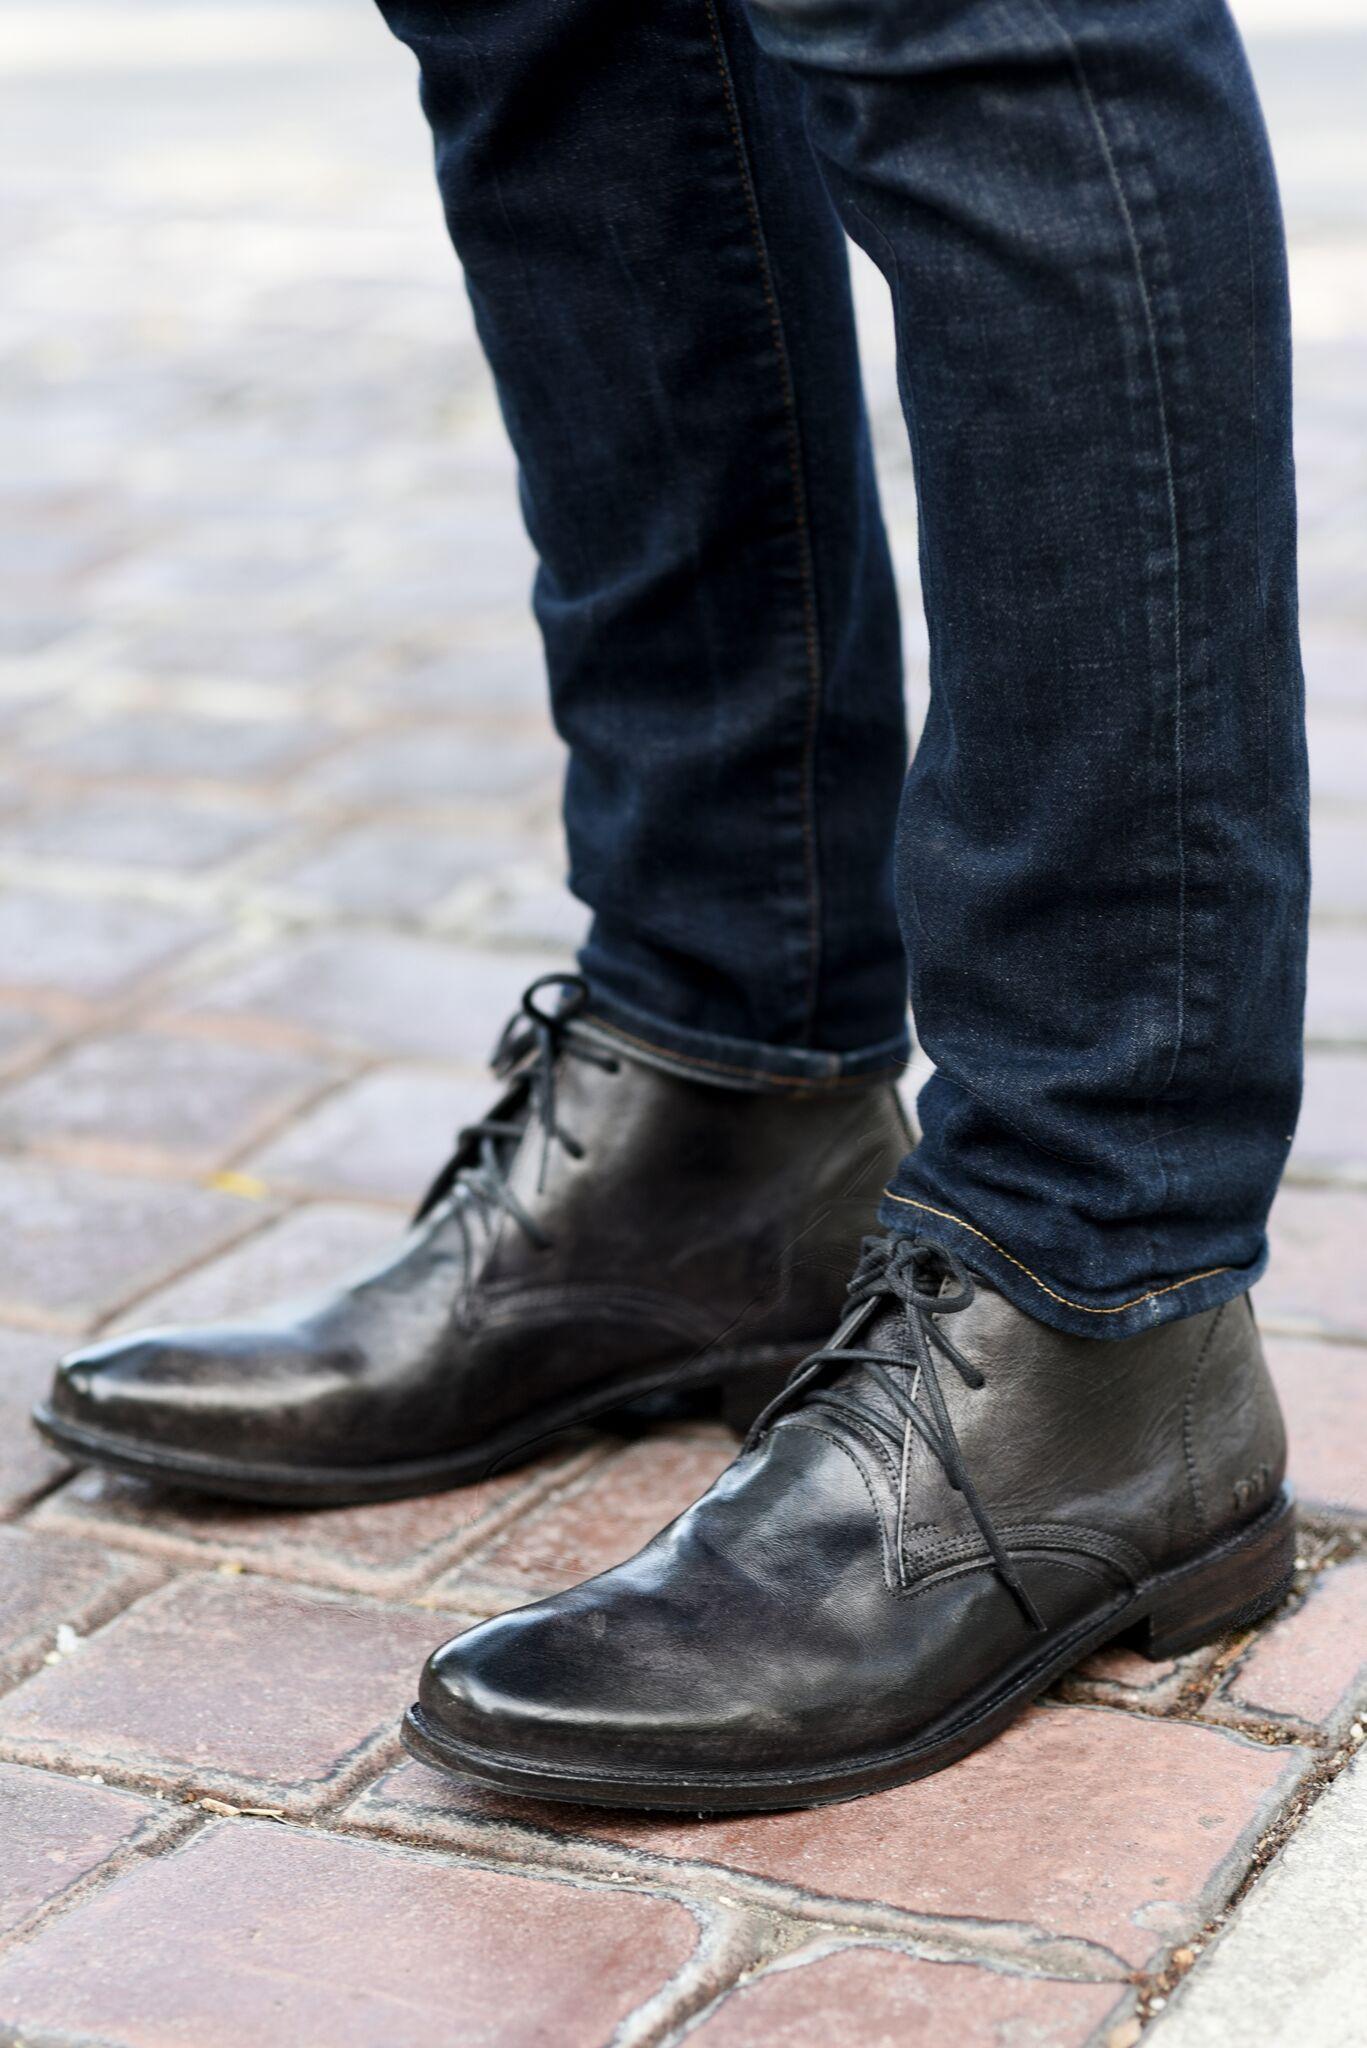 Black BEDSTU leather men's handmade lace up chukka styled